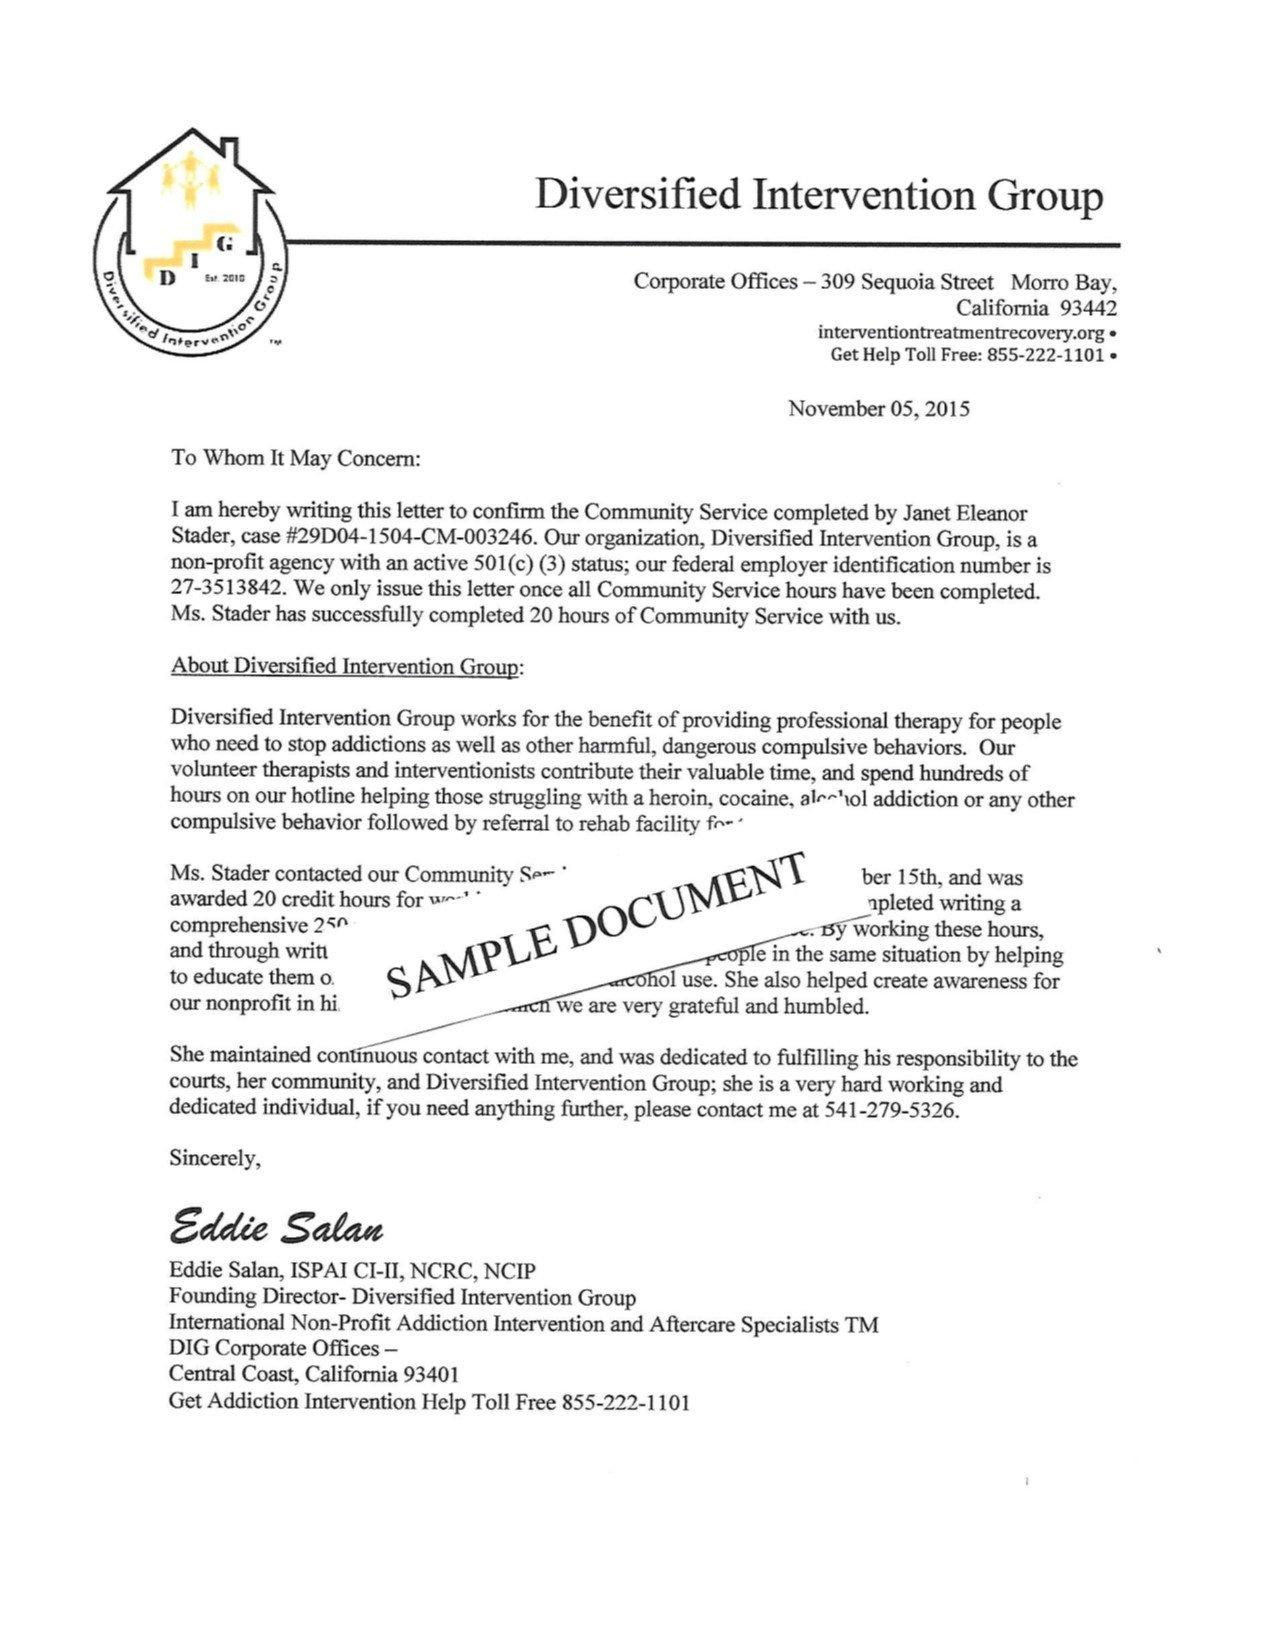 Community Service Letter Template Munity Service Letterhead Sample